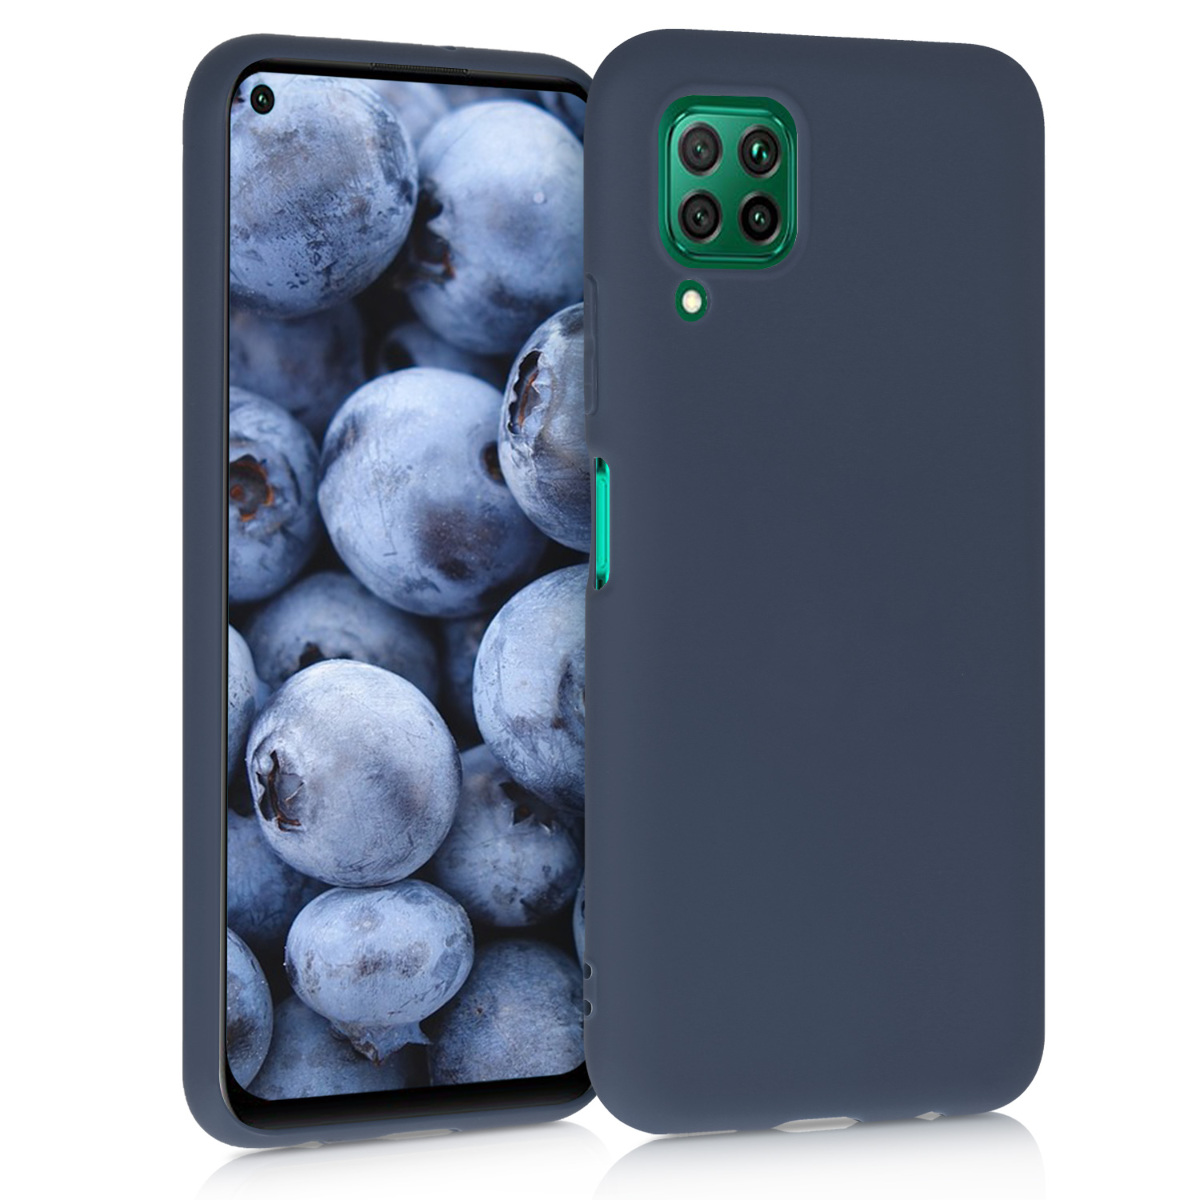 KW Θήκη Σιλικόνης Huawei P40 Lite - Dark Blue Matte (51519.53)